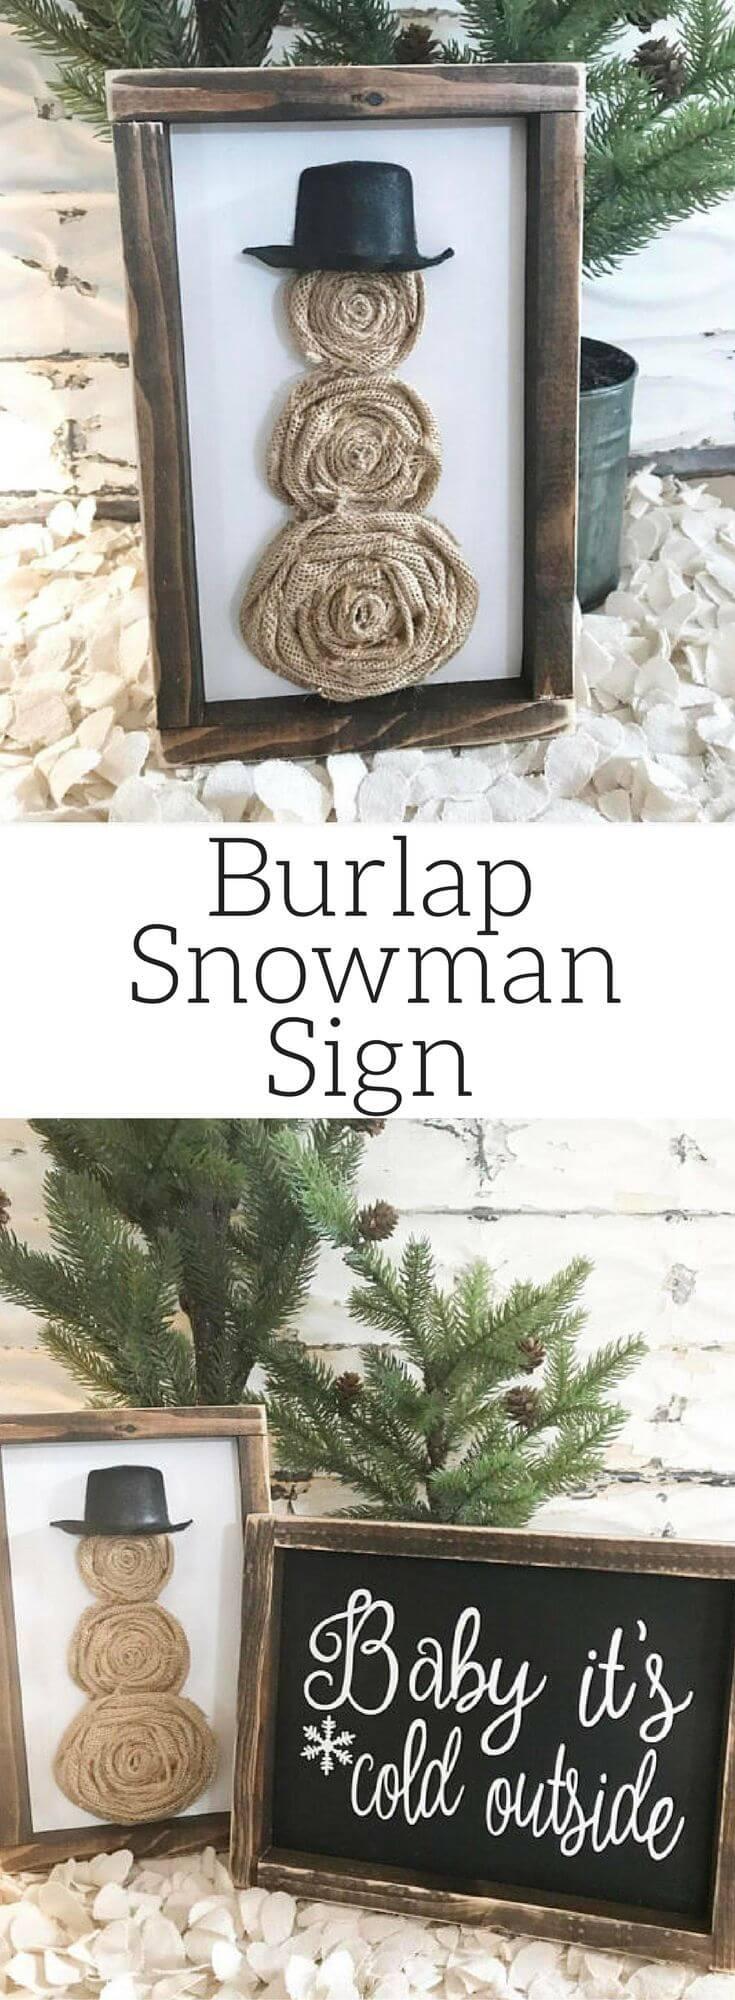 Rustic Winter Decor Sign Ideas